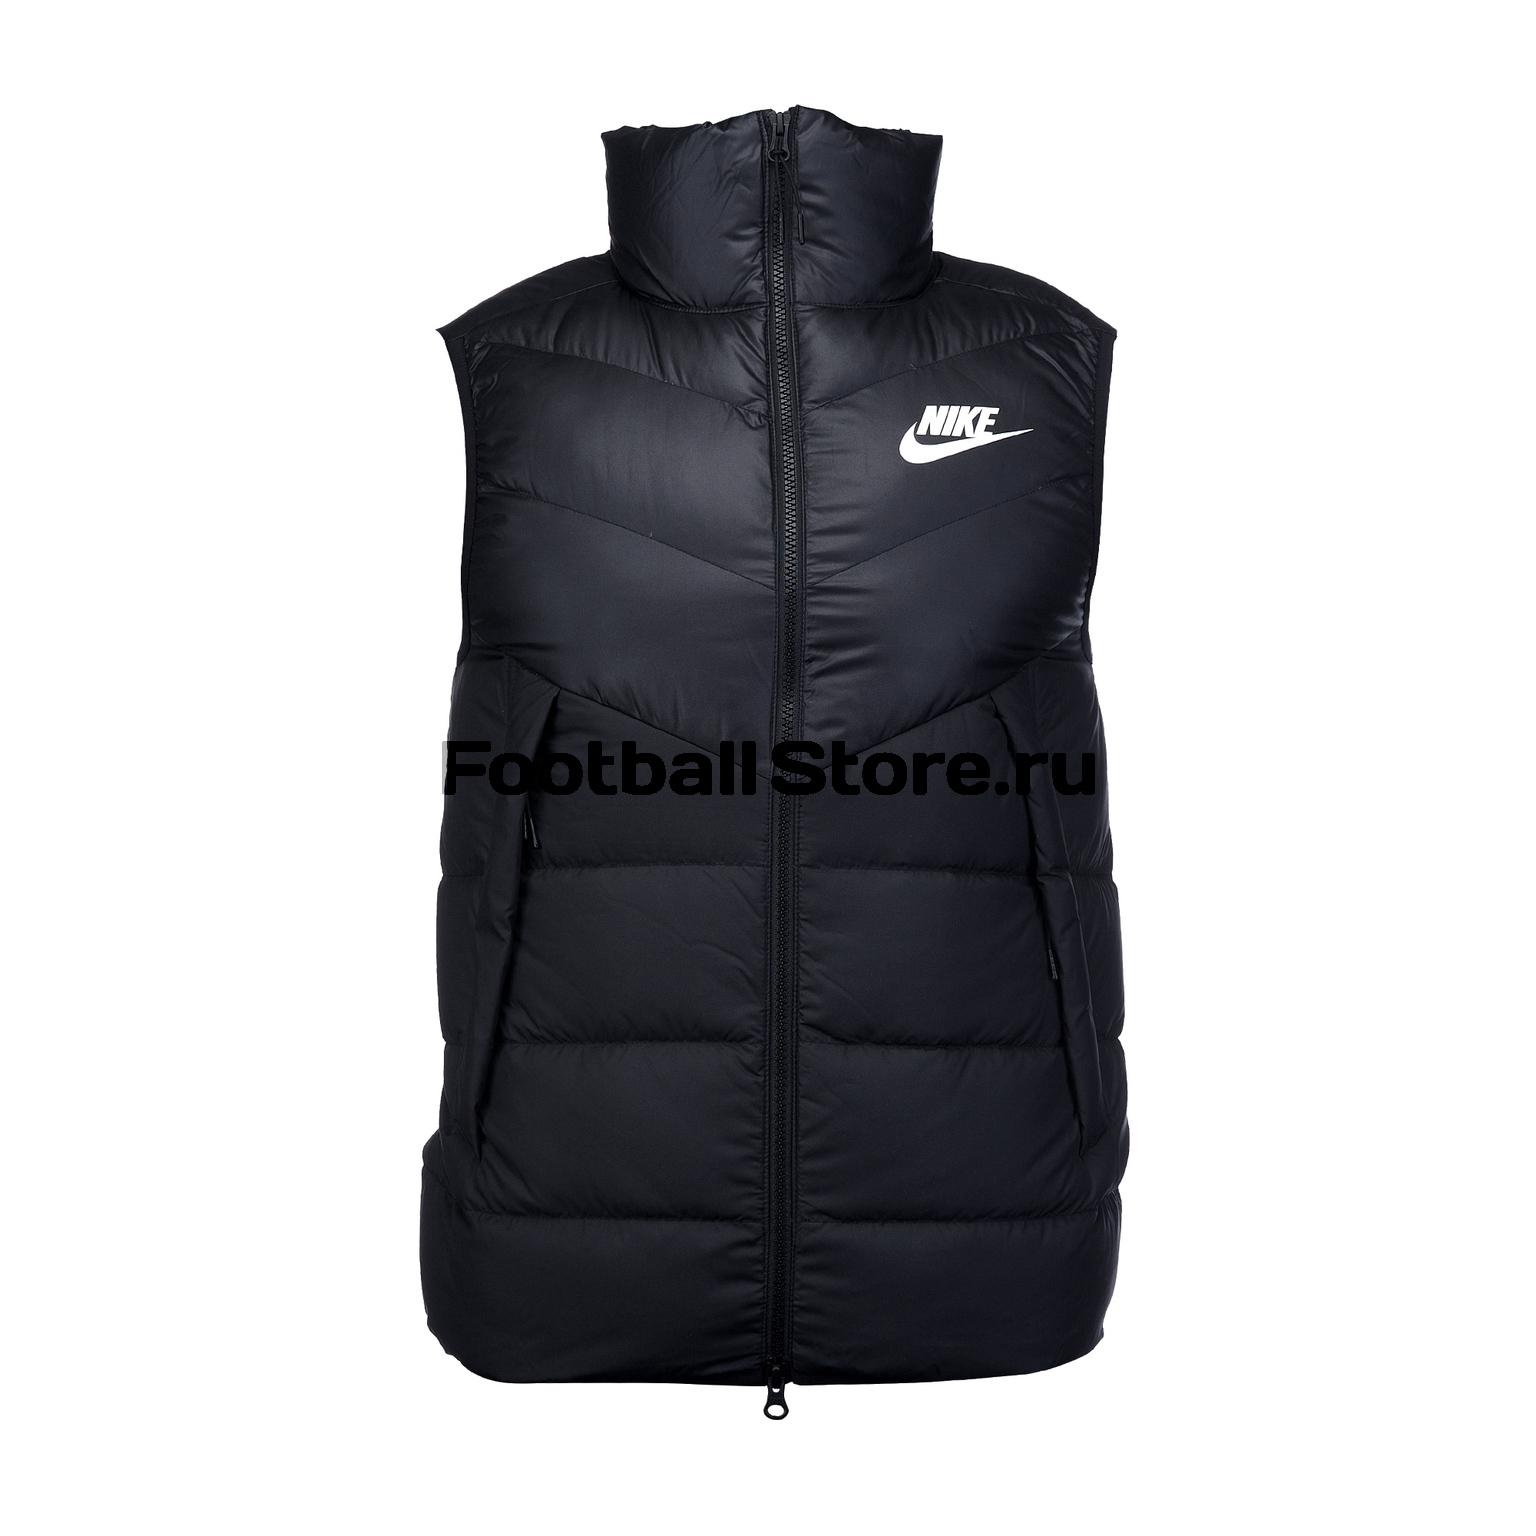 Жилет Nike Down Fill Vest 928859-010